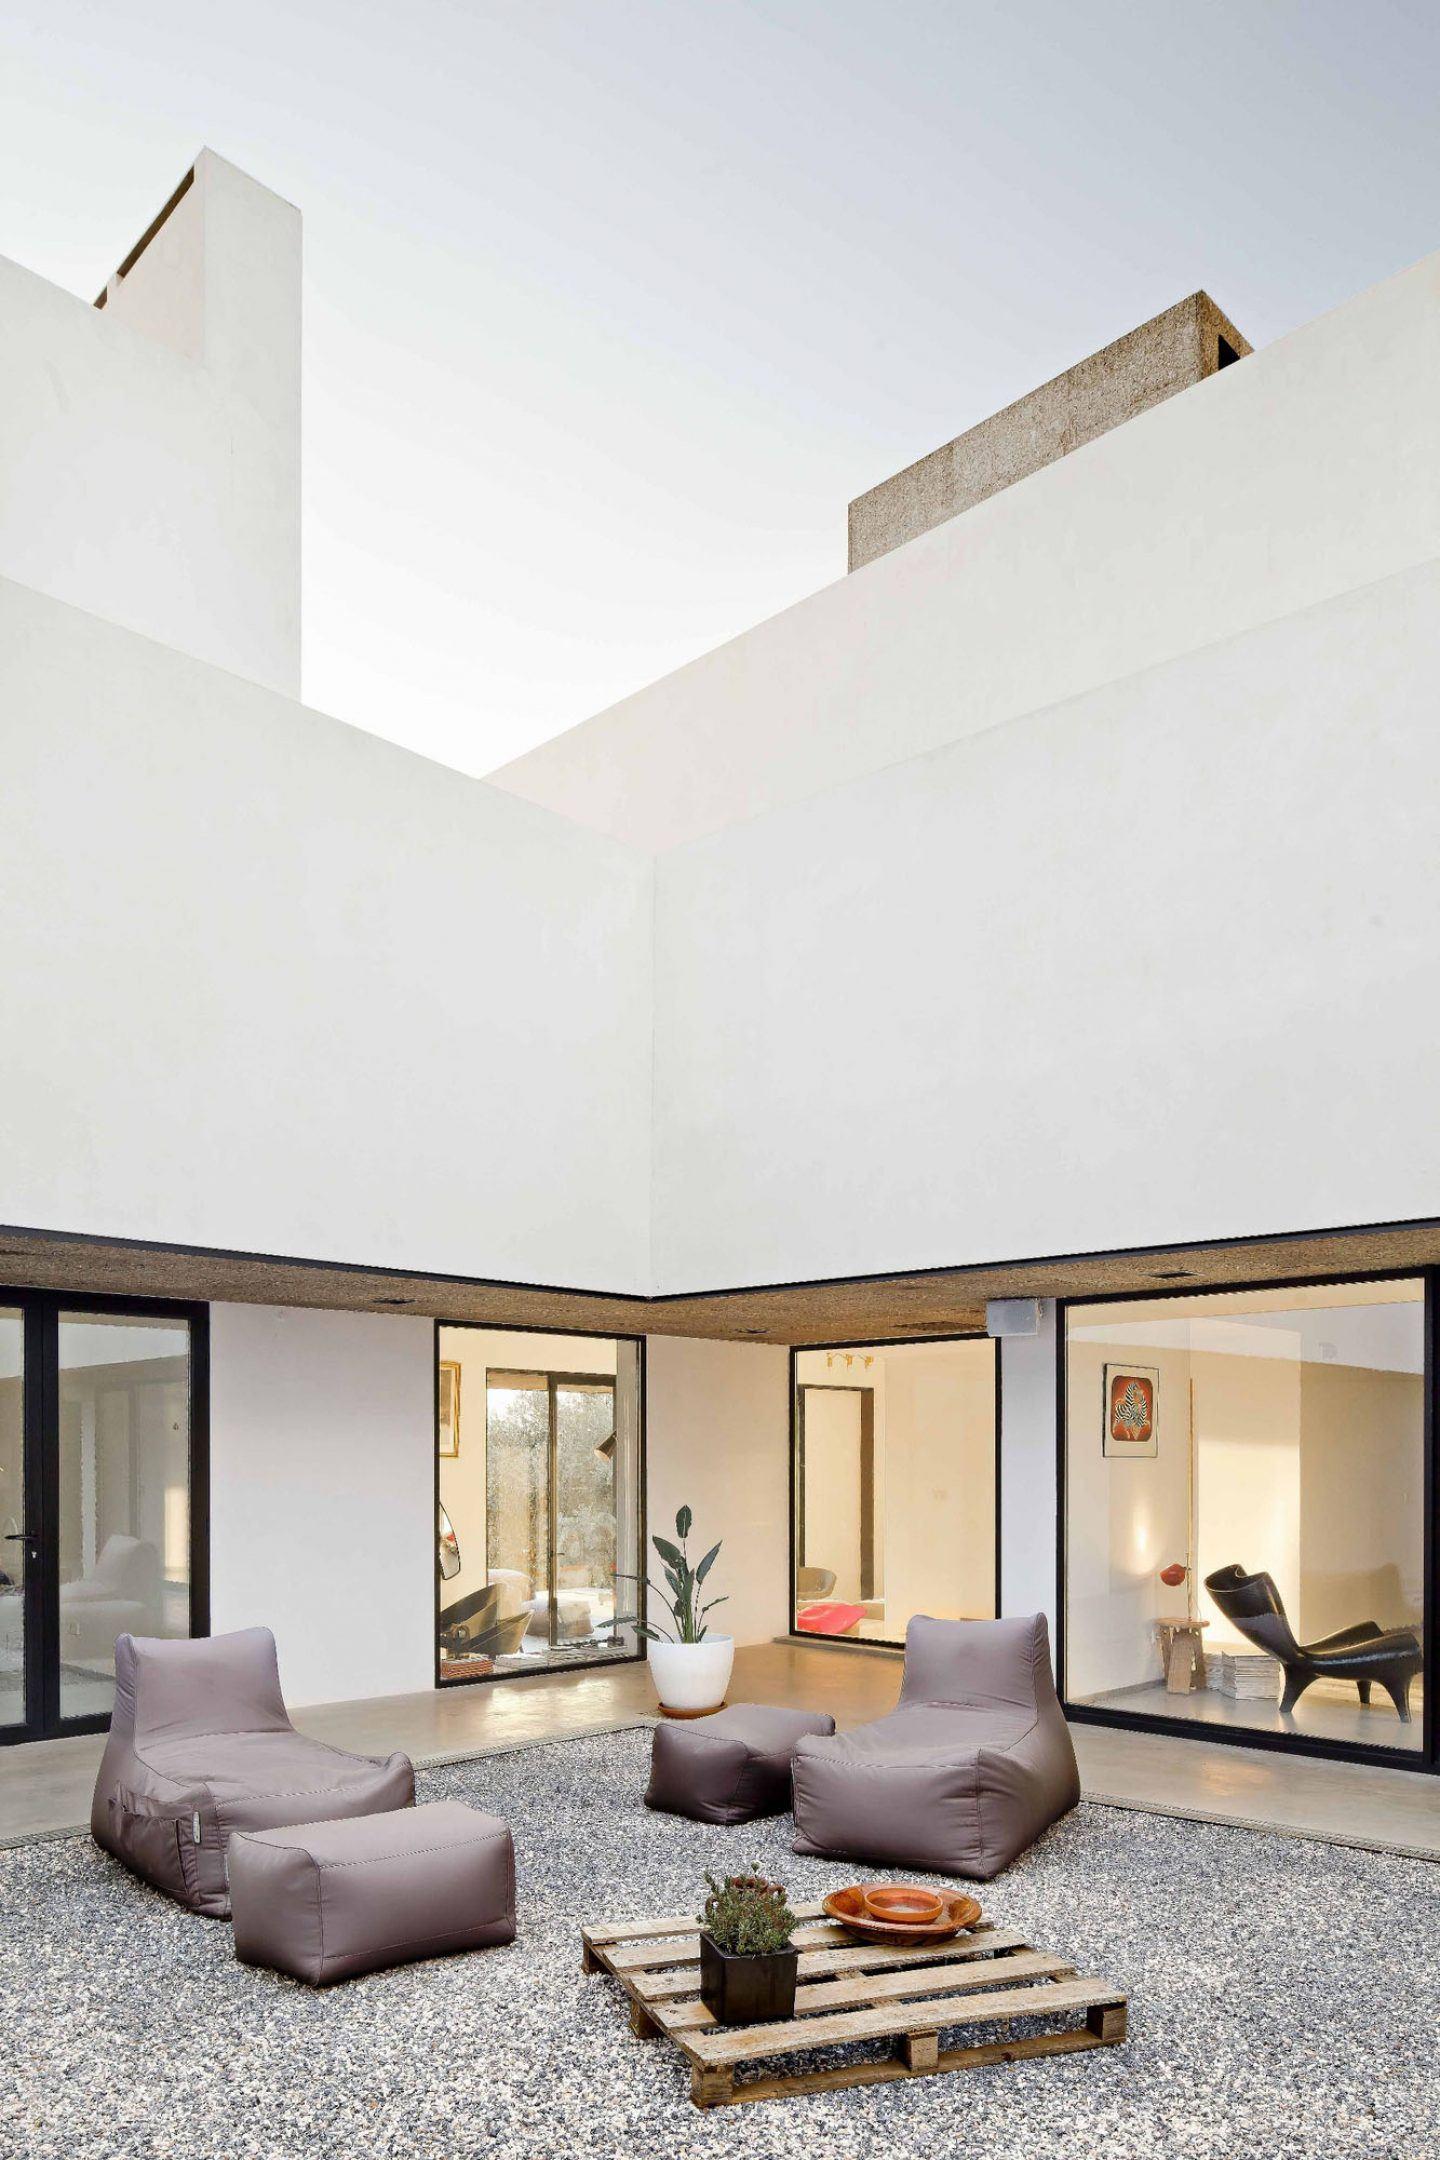 IGNANT-Architecture-Alepo-Vora-Villa-Extramuros-04